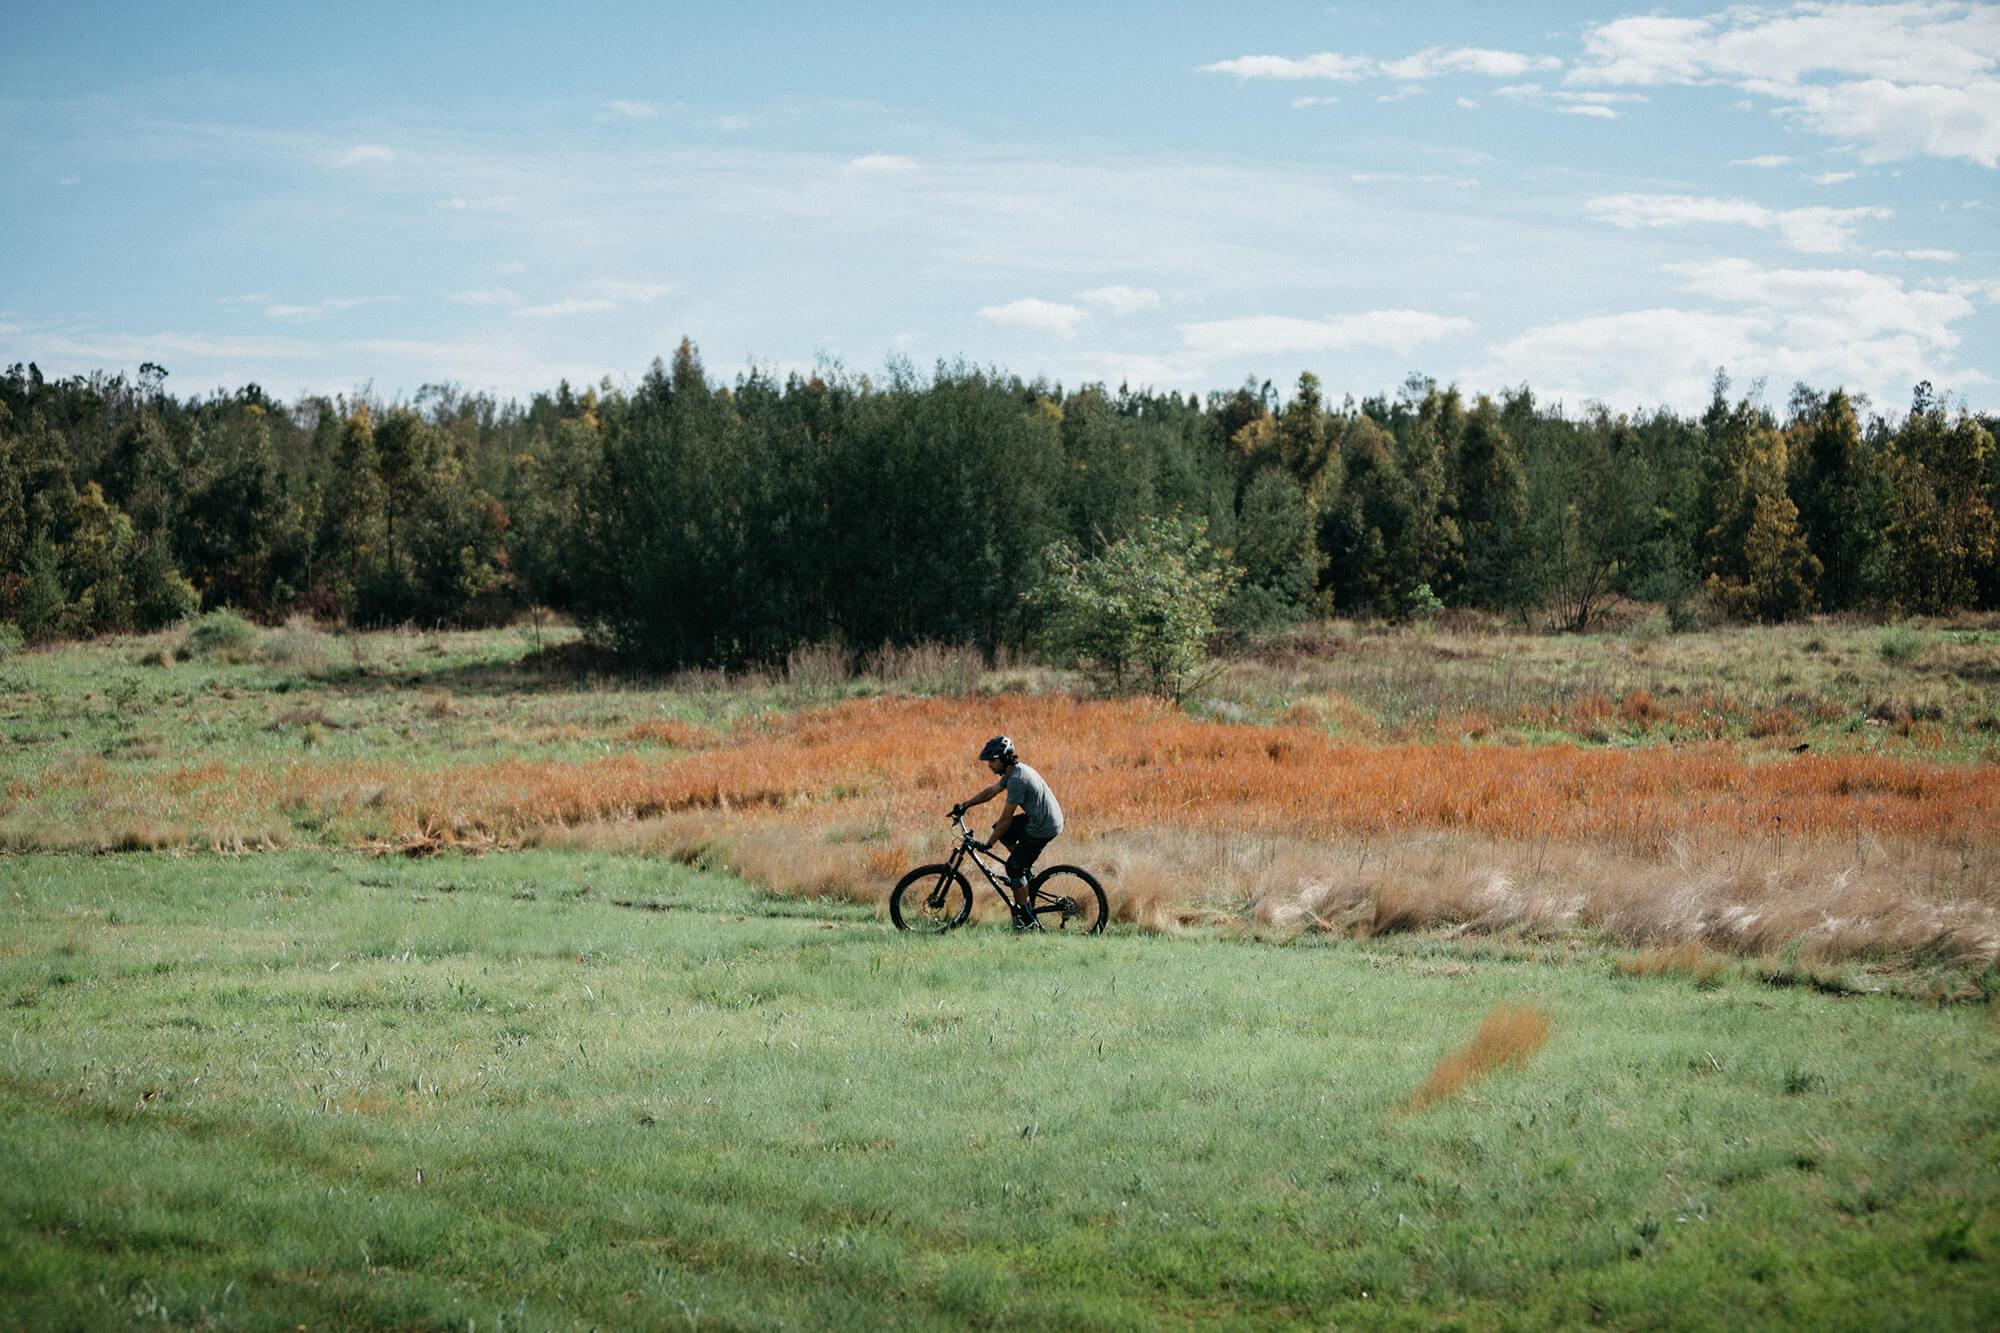 Blue Single Track Trail